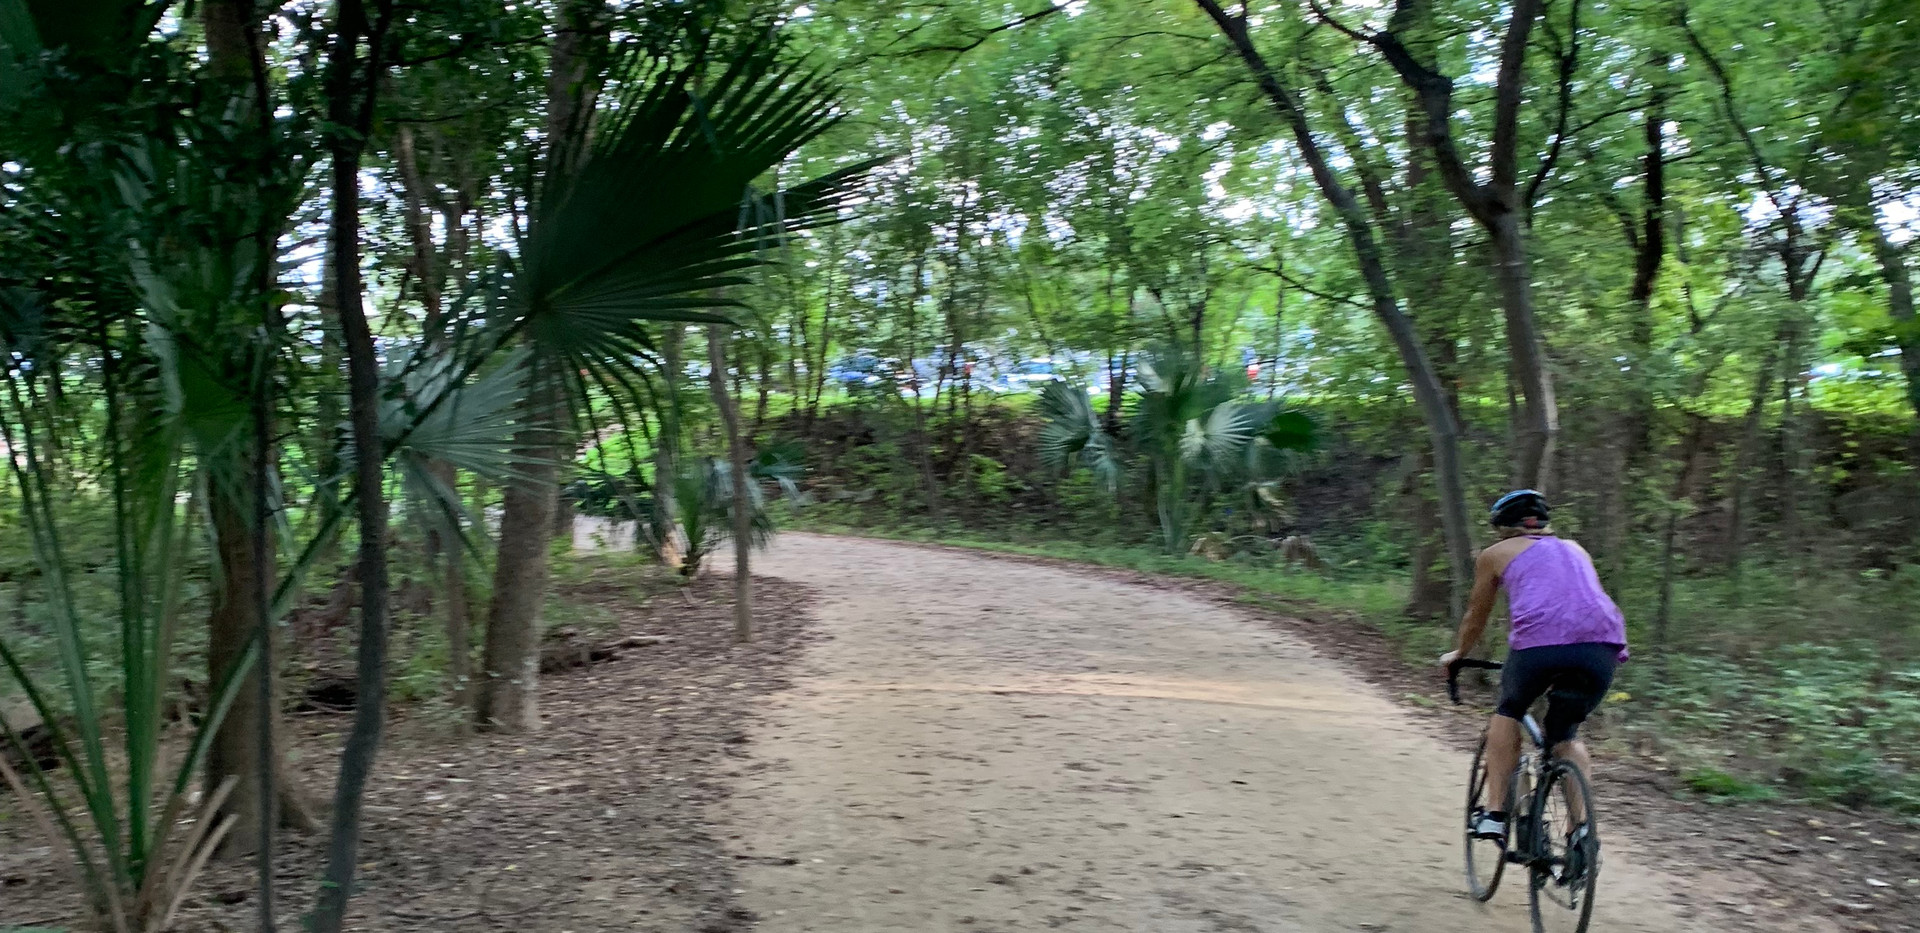 Townlake: Biking inside the trail